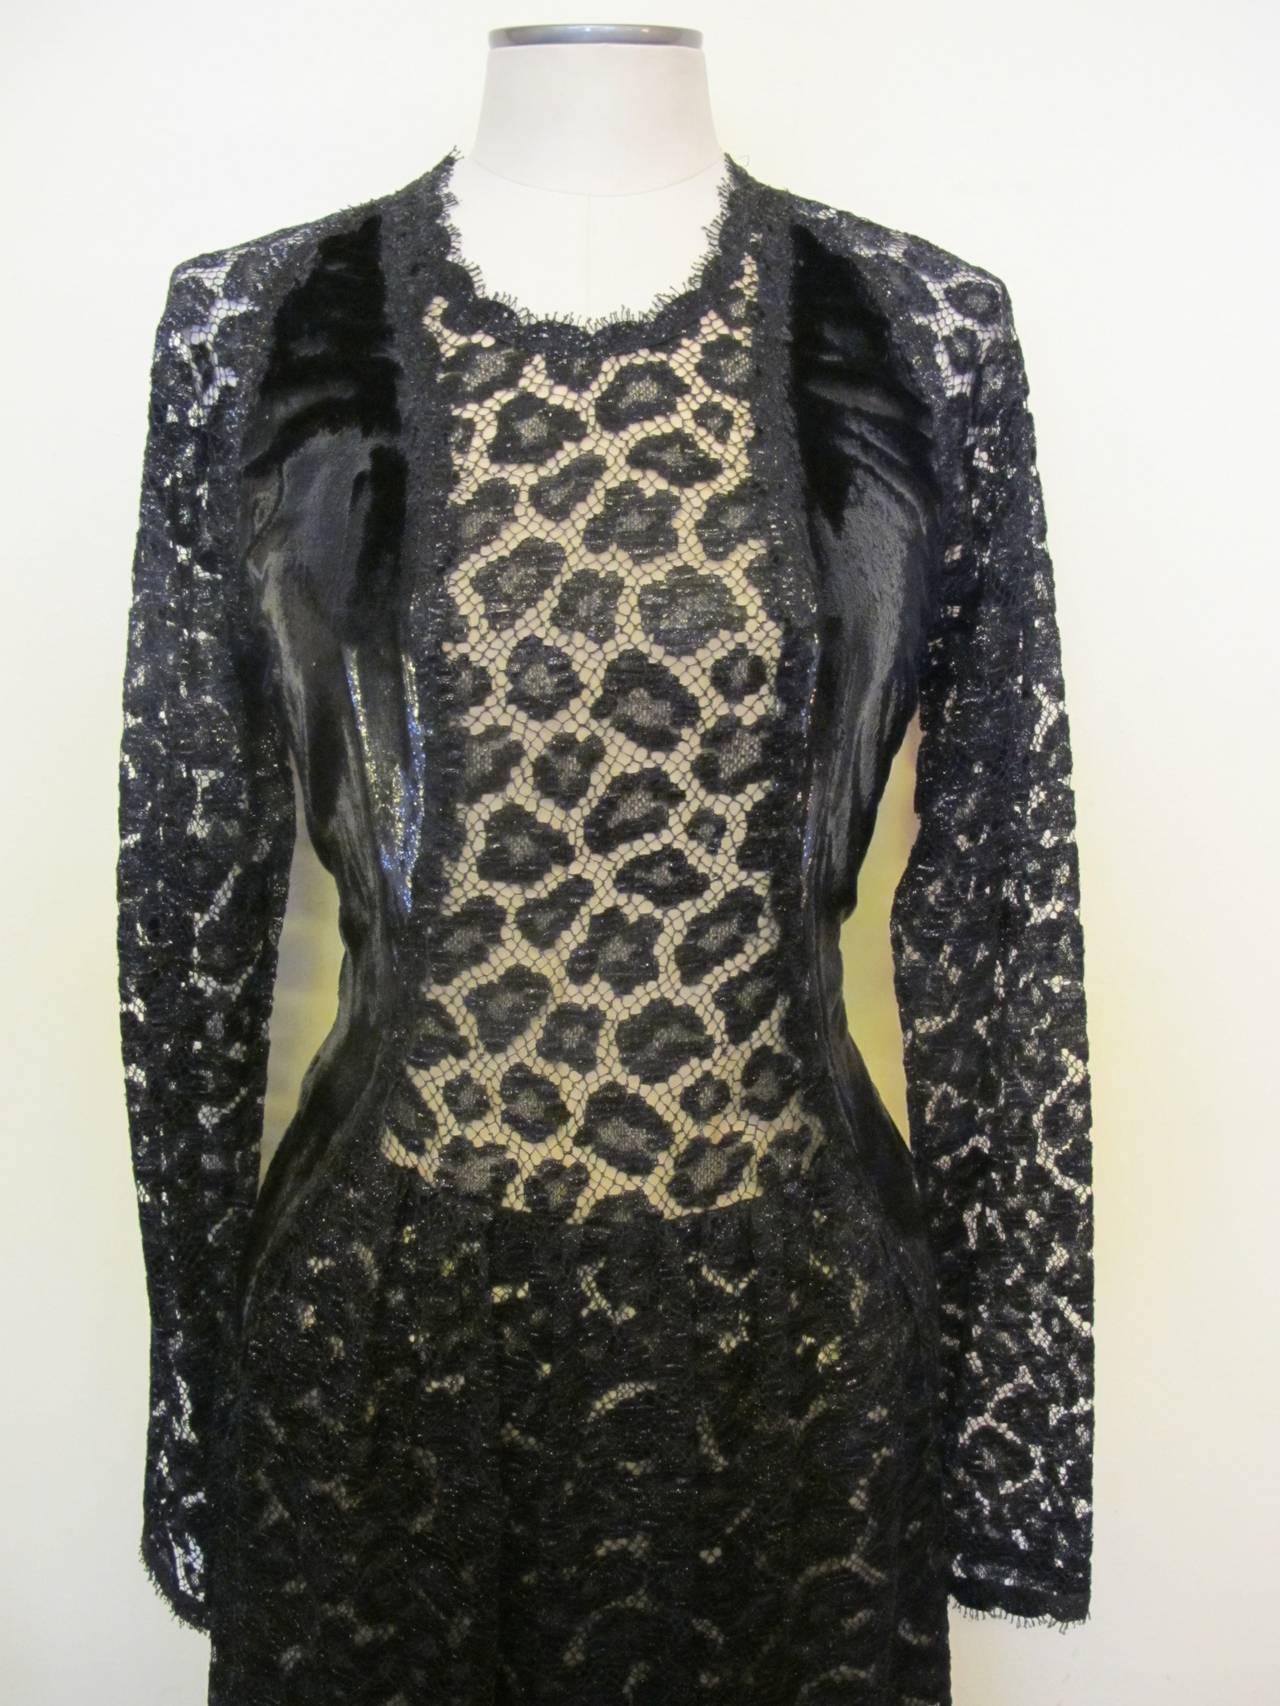 Geoffrey Beene Black Lace Cocktail Dress with Leopard Design 6